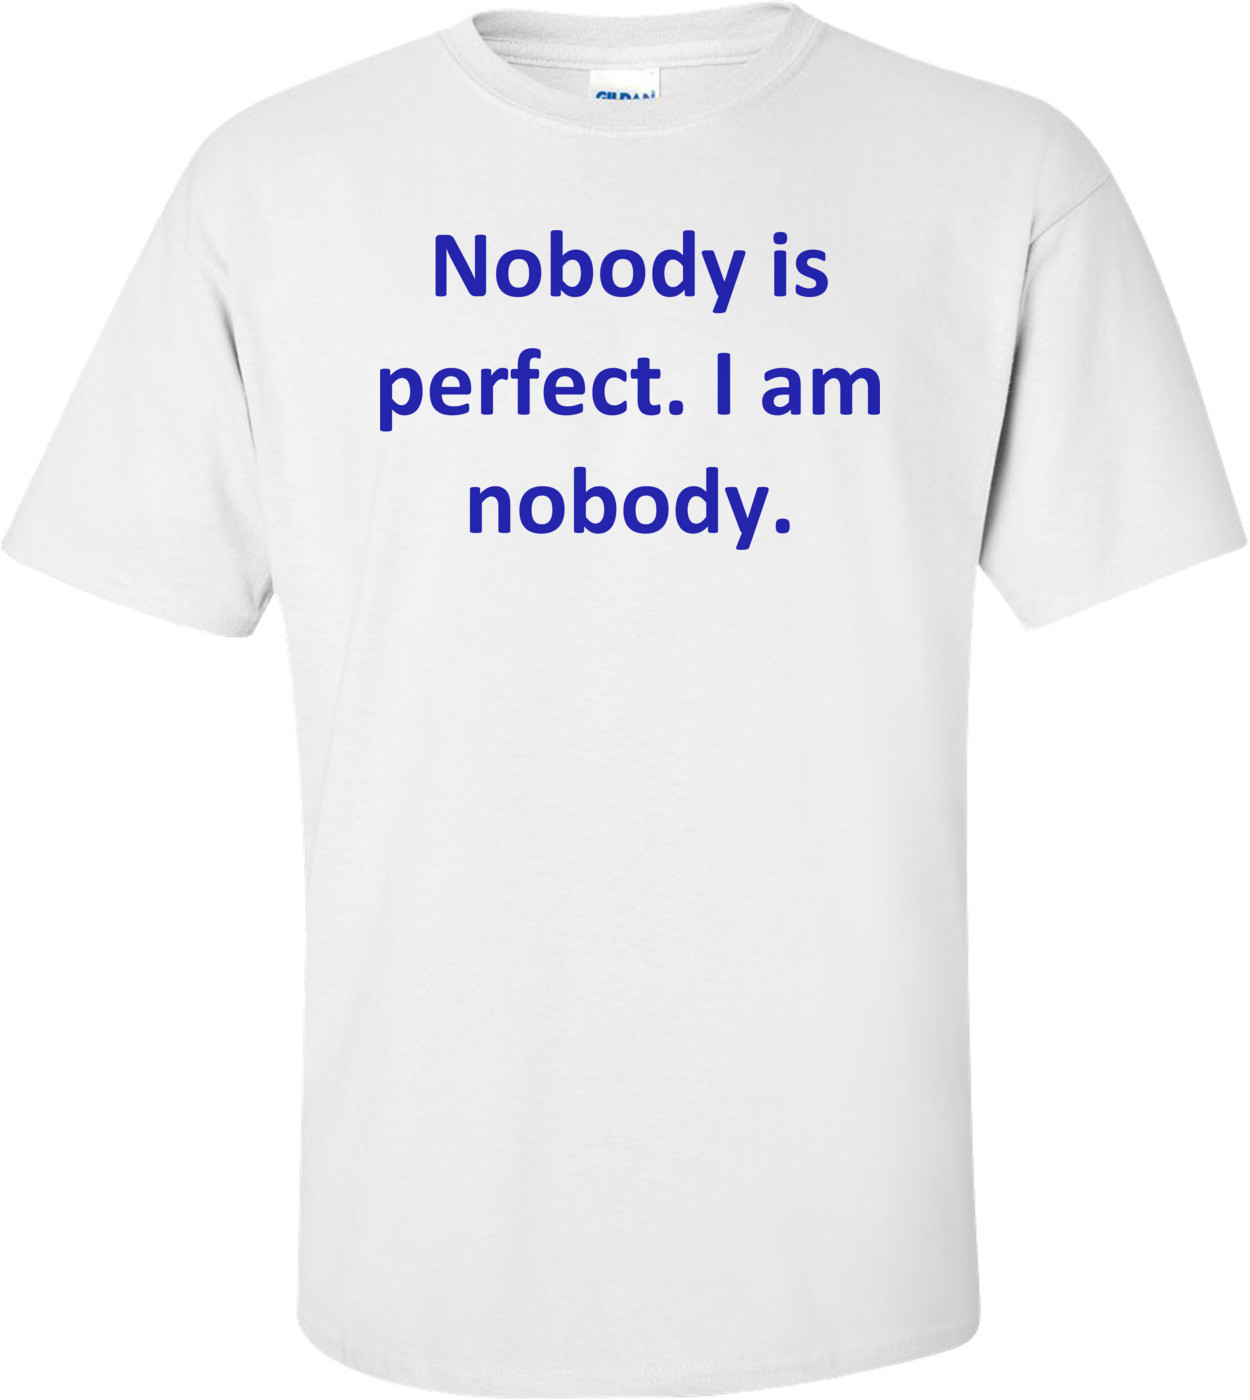 Nobody is perfect. I am nobody. Shirt